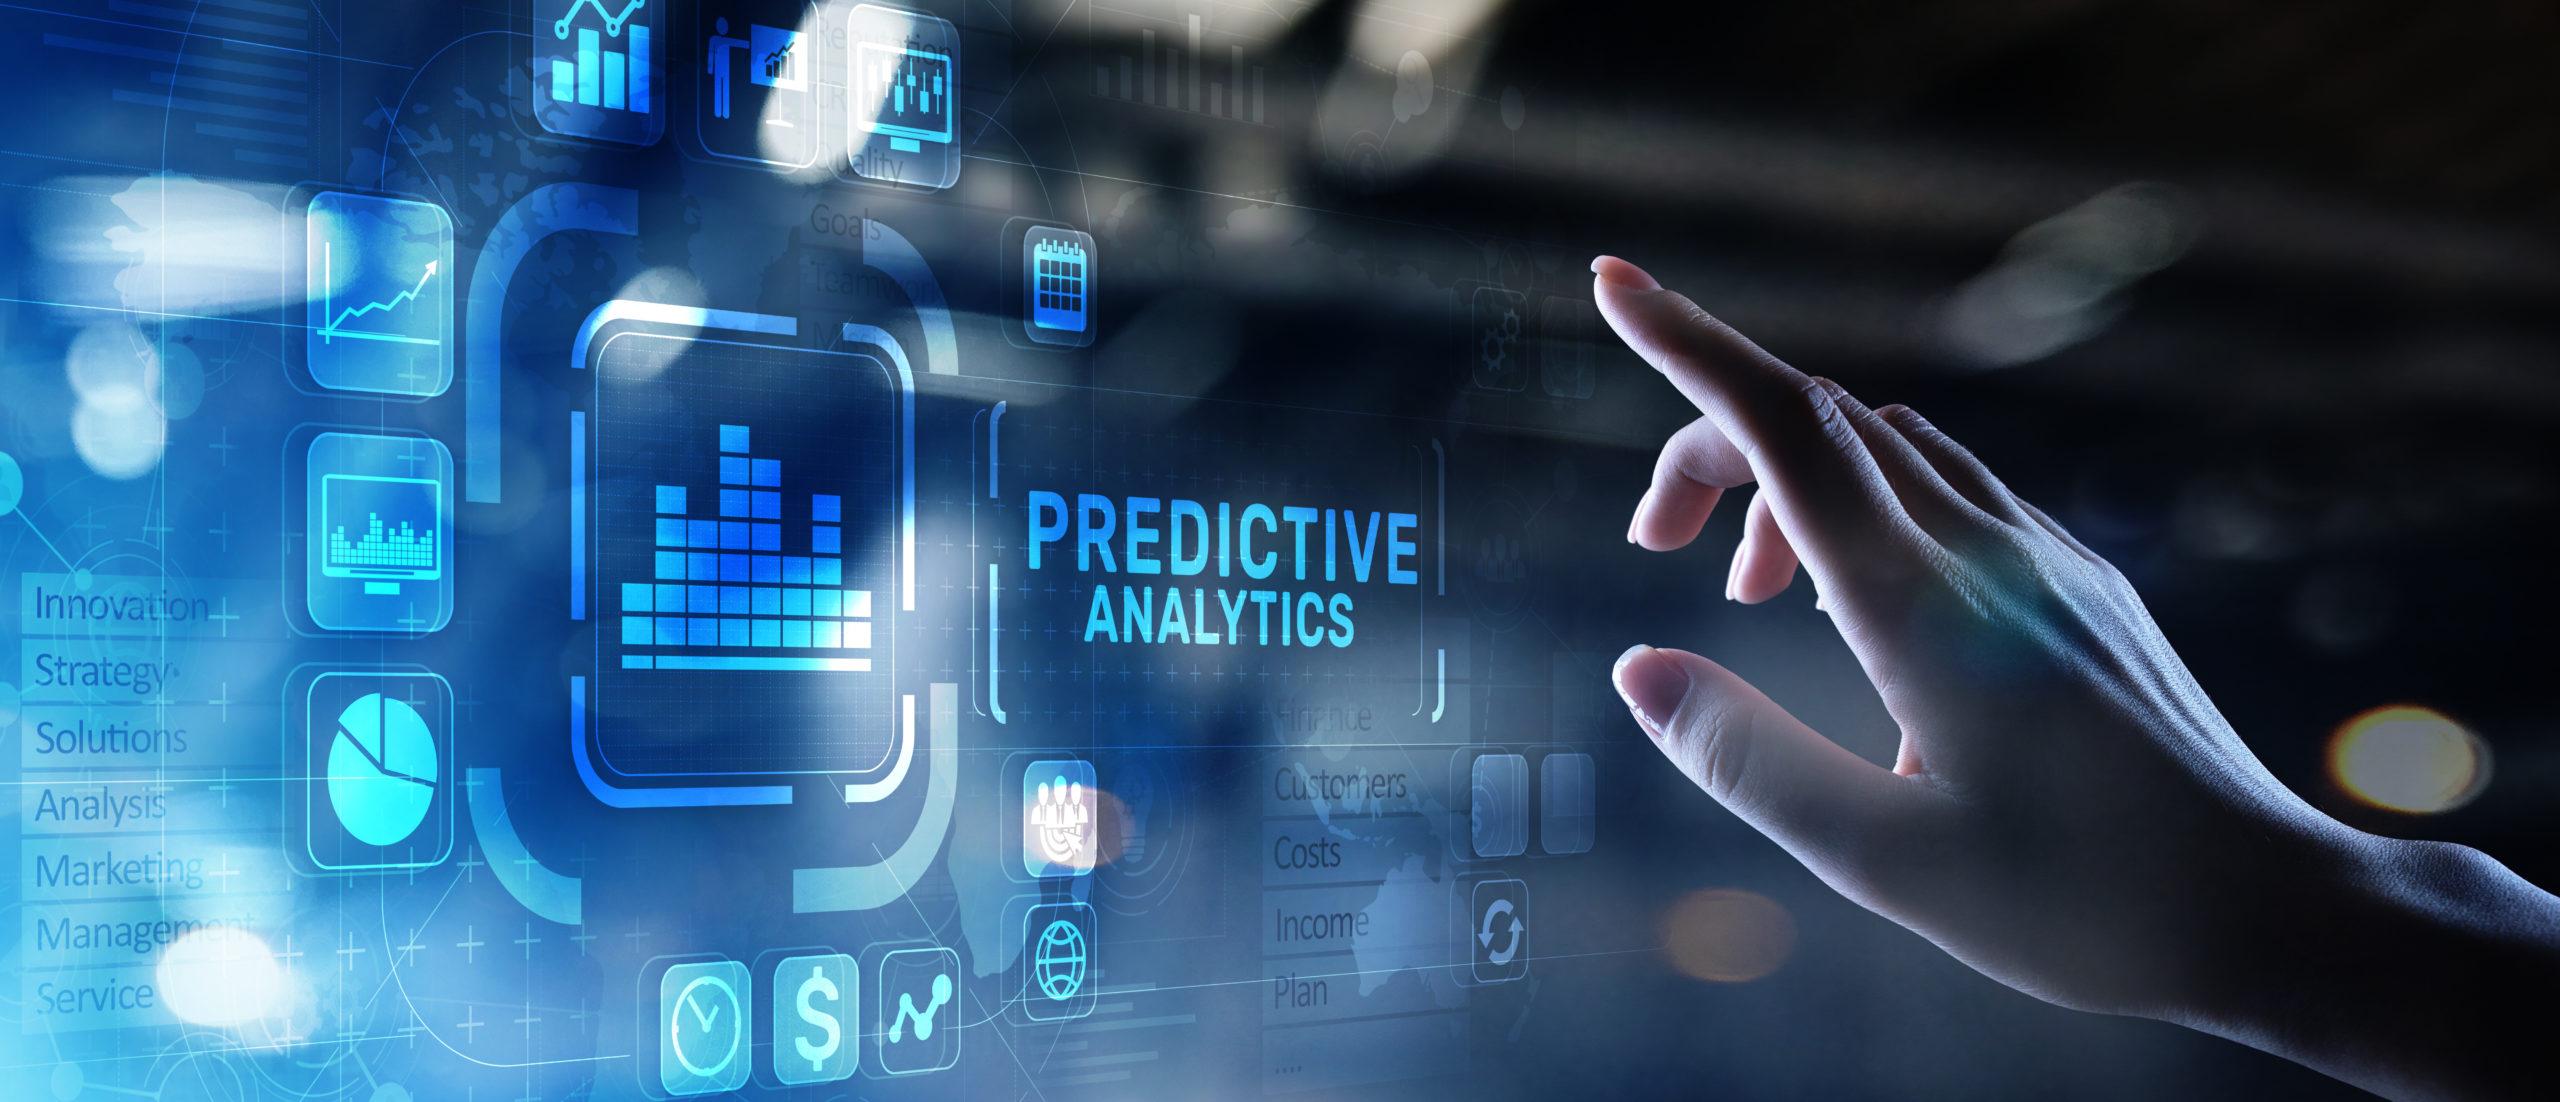 Data Analytics & predictive models